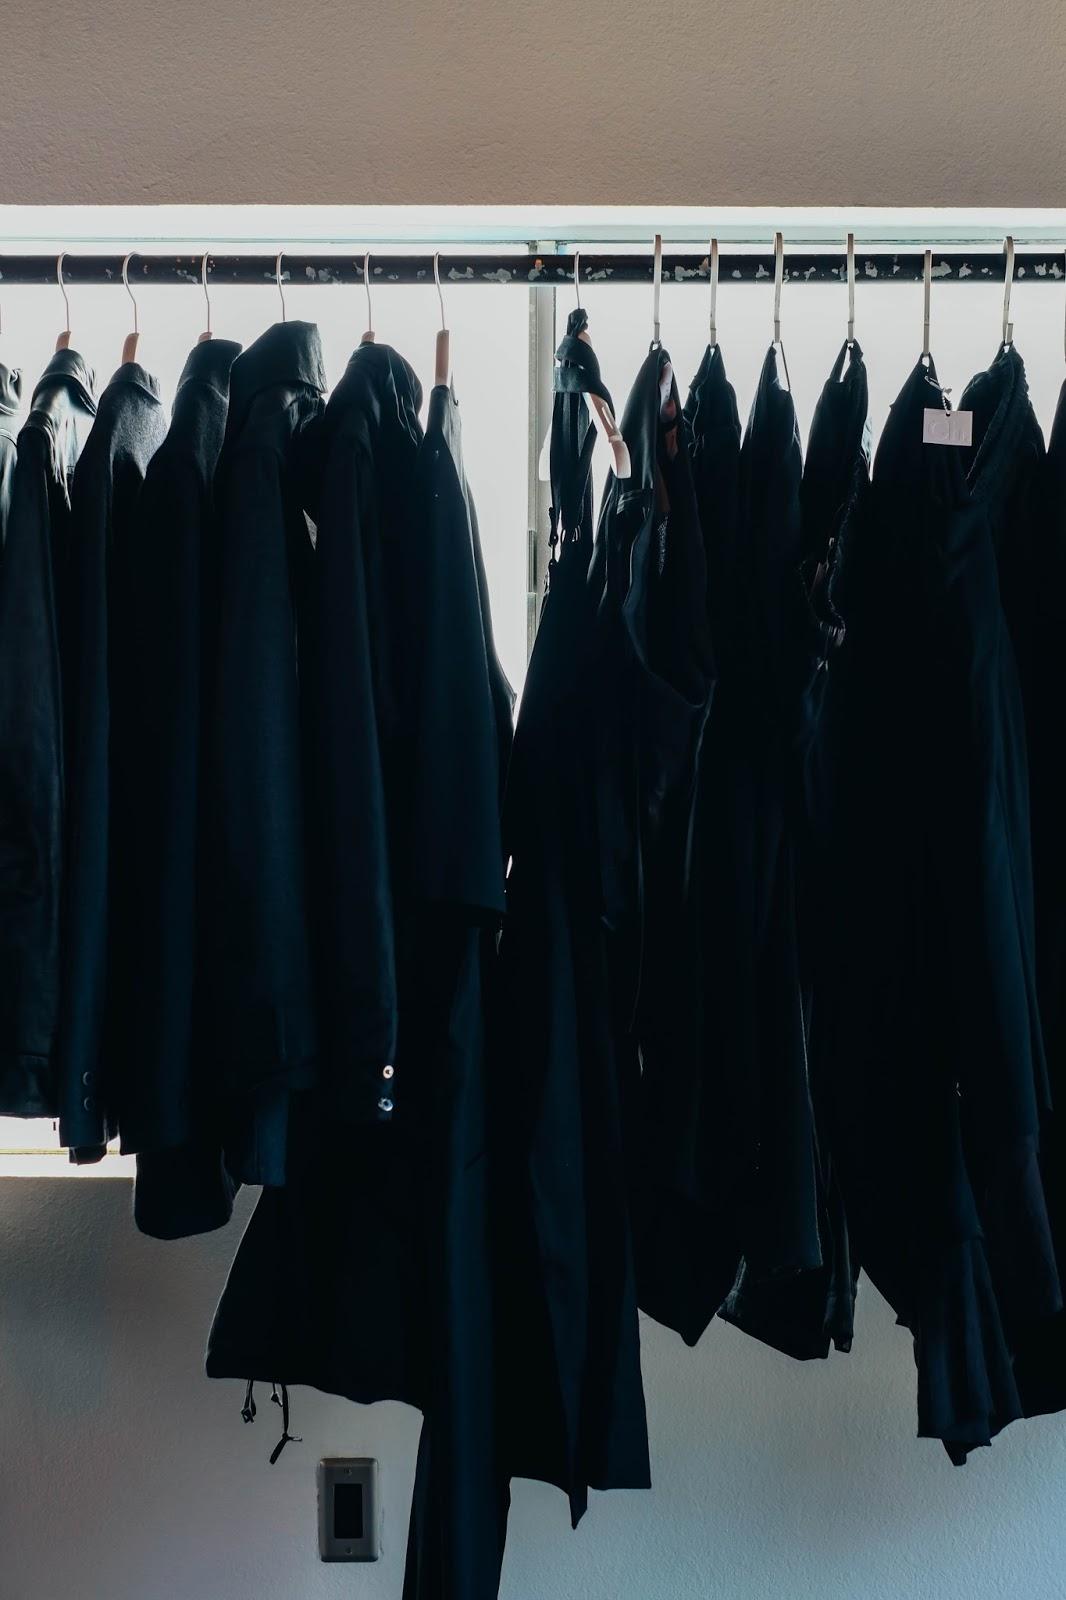 mybelonging-chapter-studio-menswear-losangeles-2.jpg